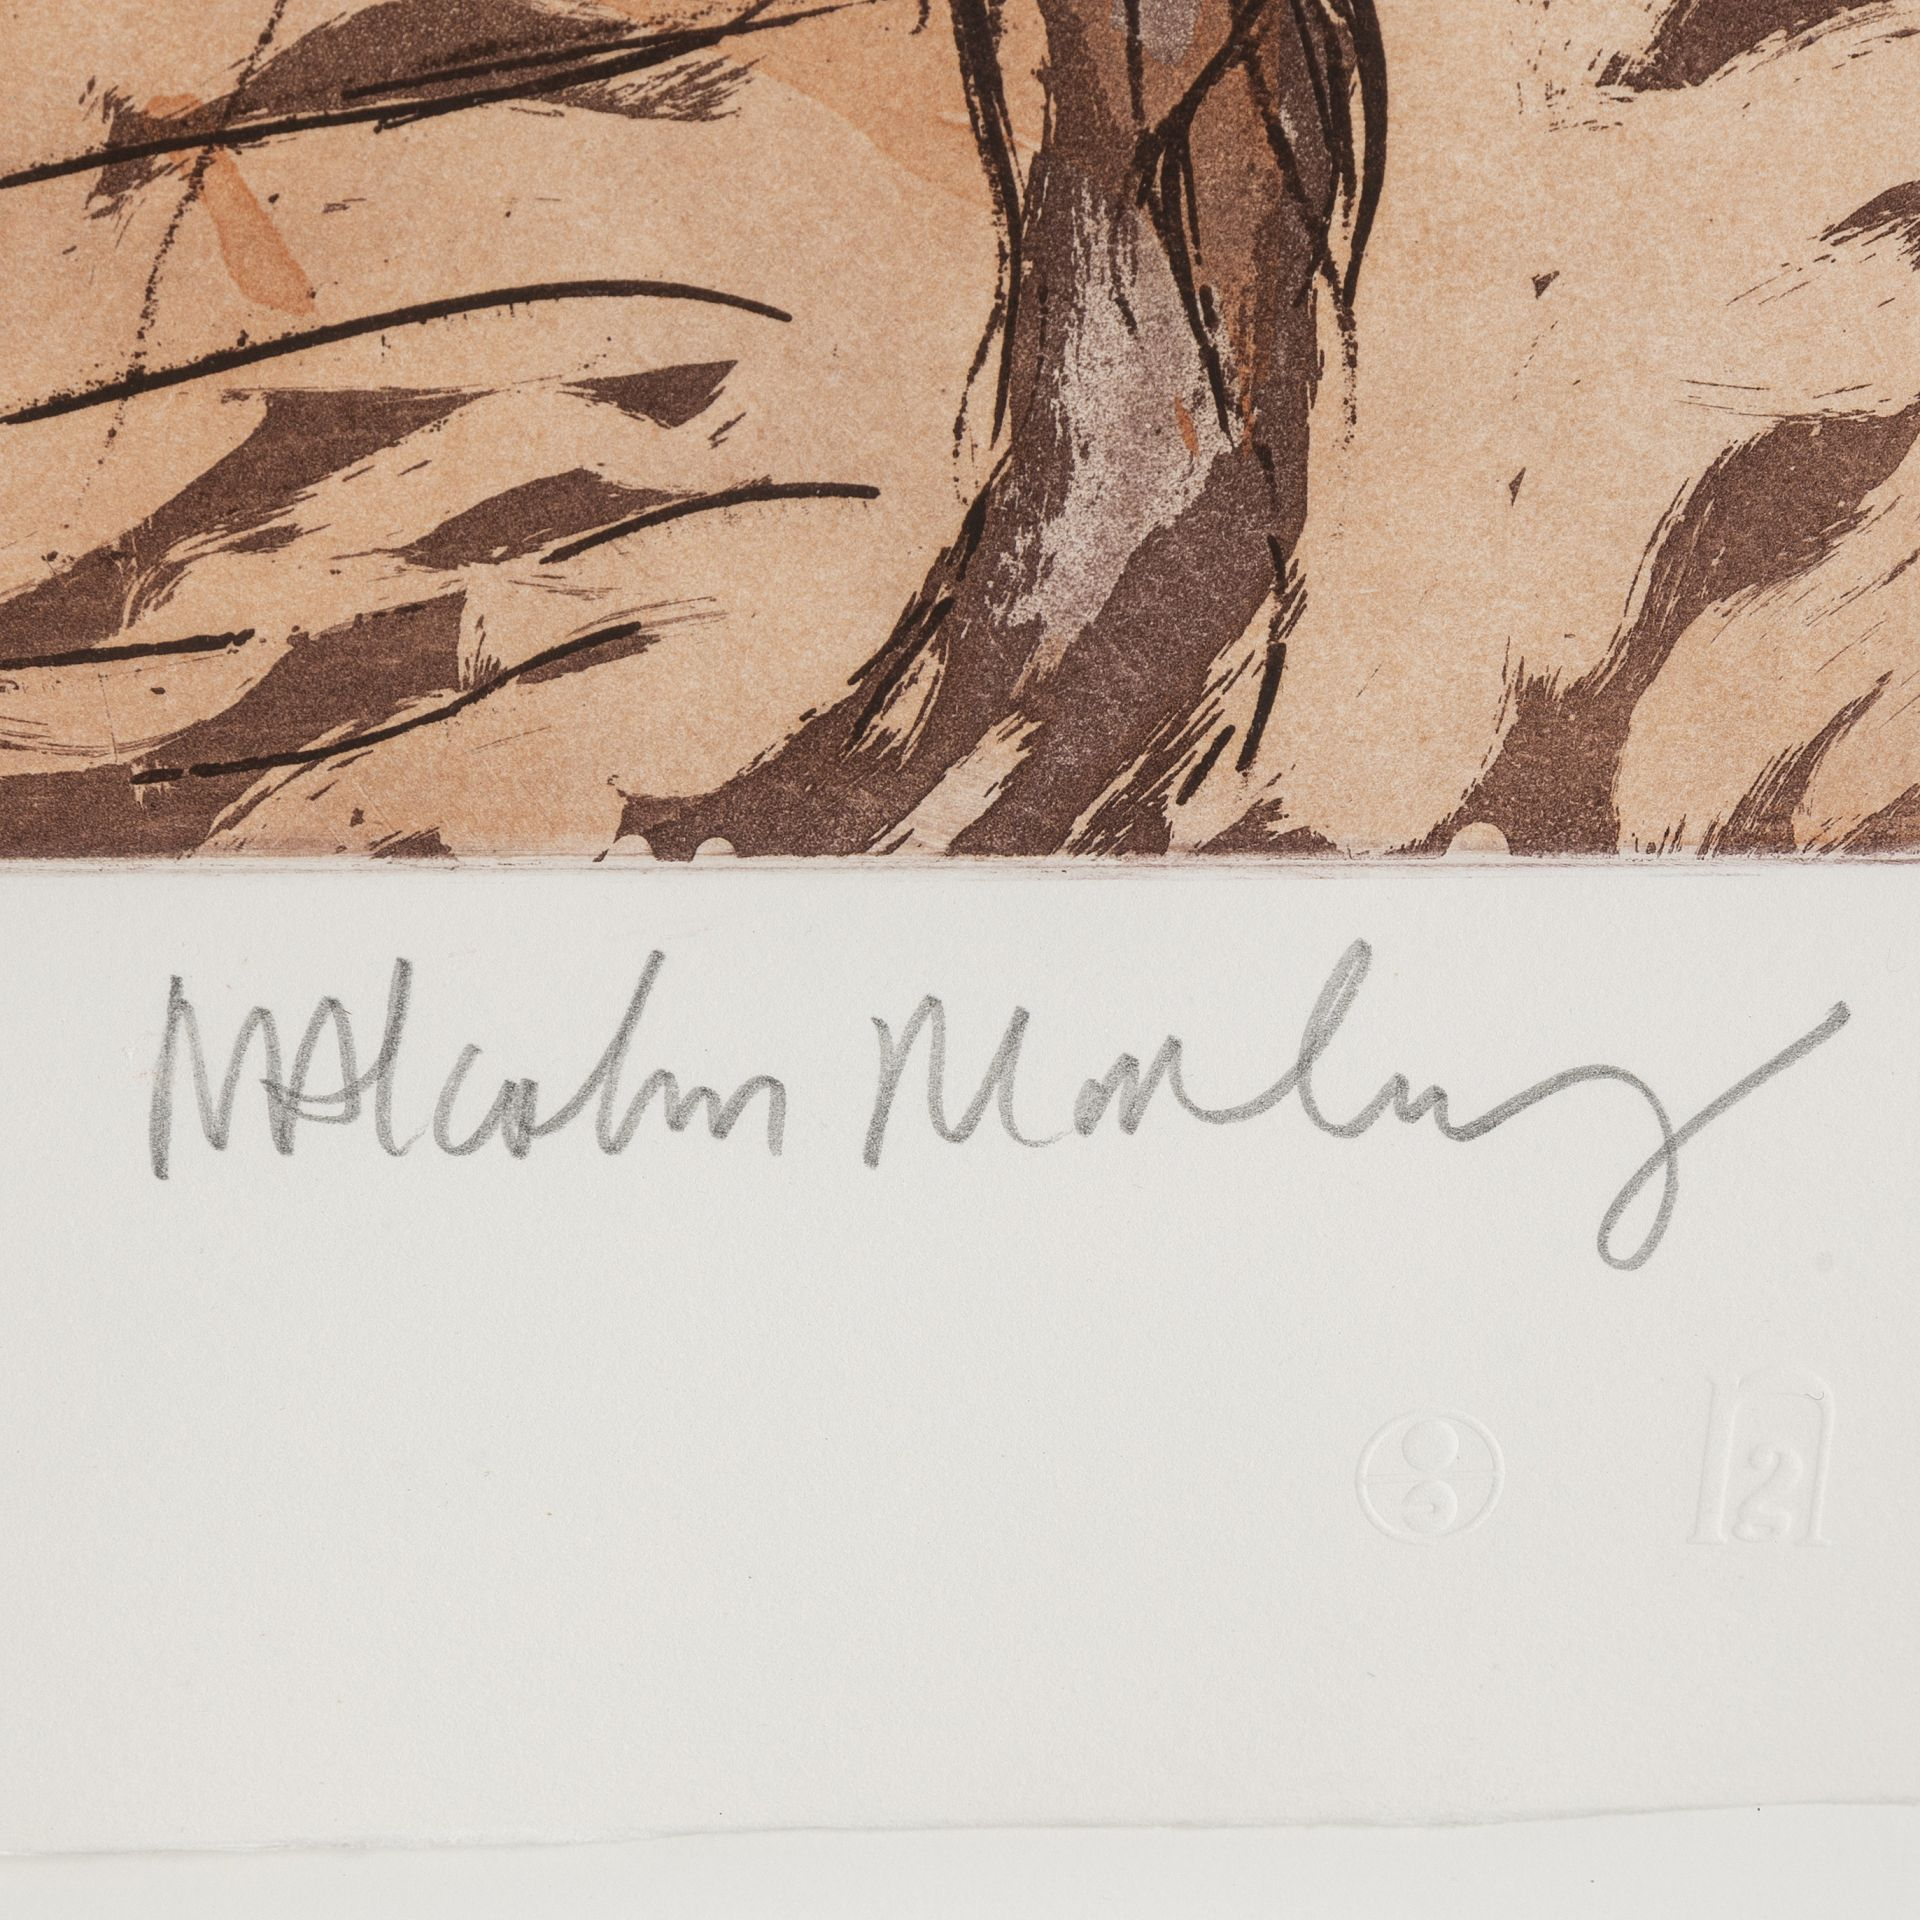 Signature Malcolm Morley